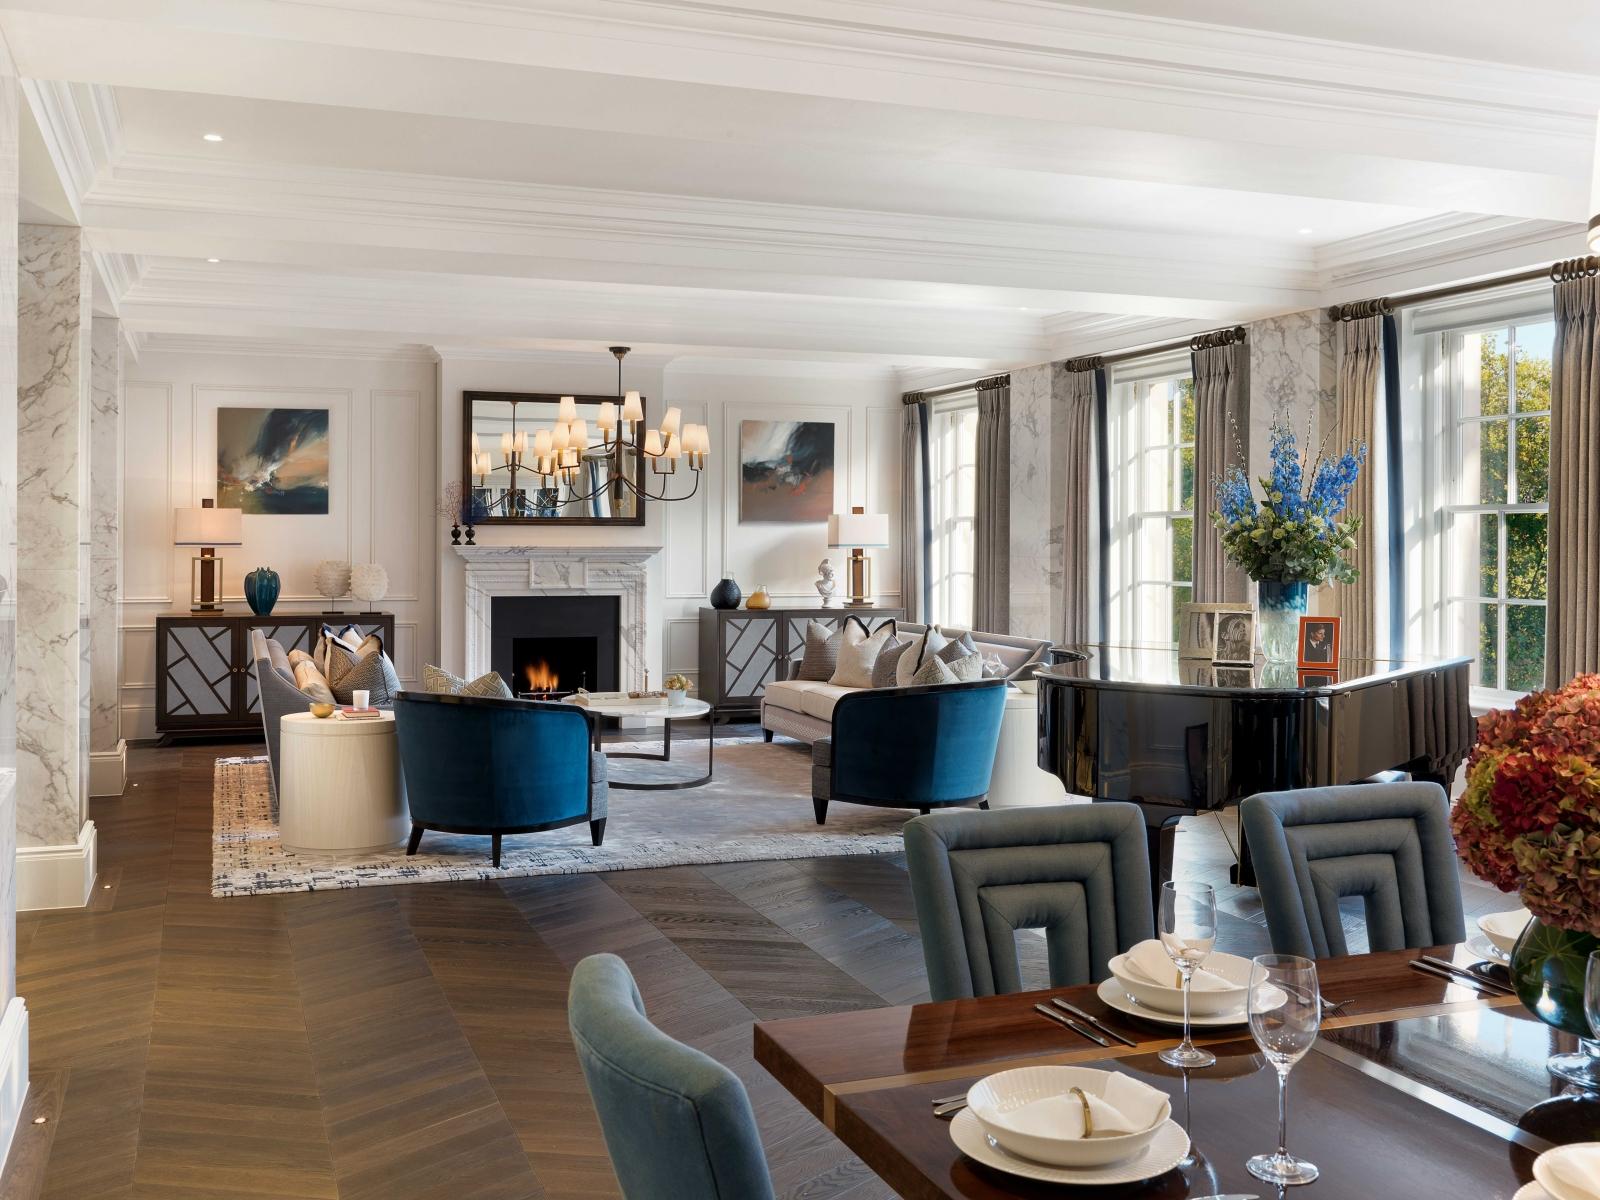 CapitalRise - 18 Grosvenor Square flat